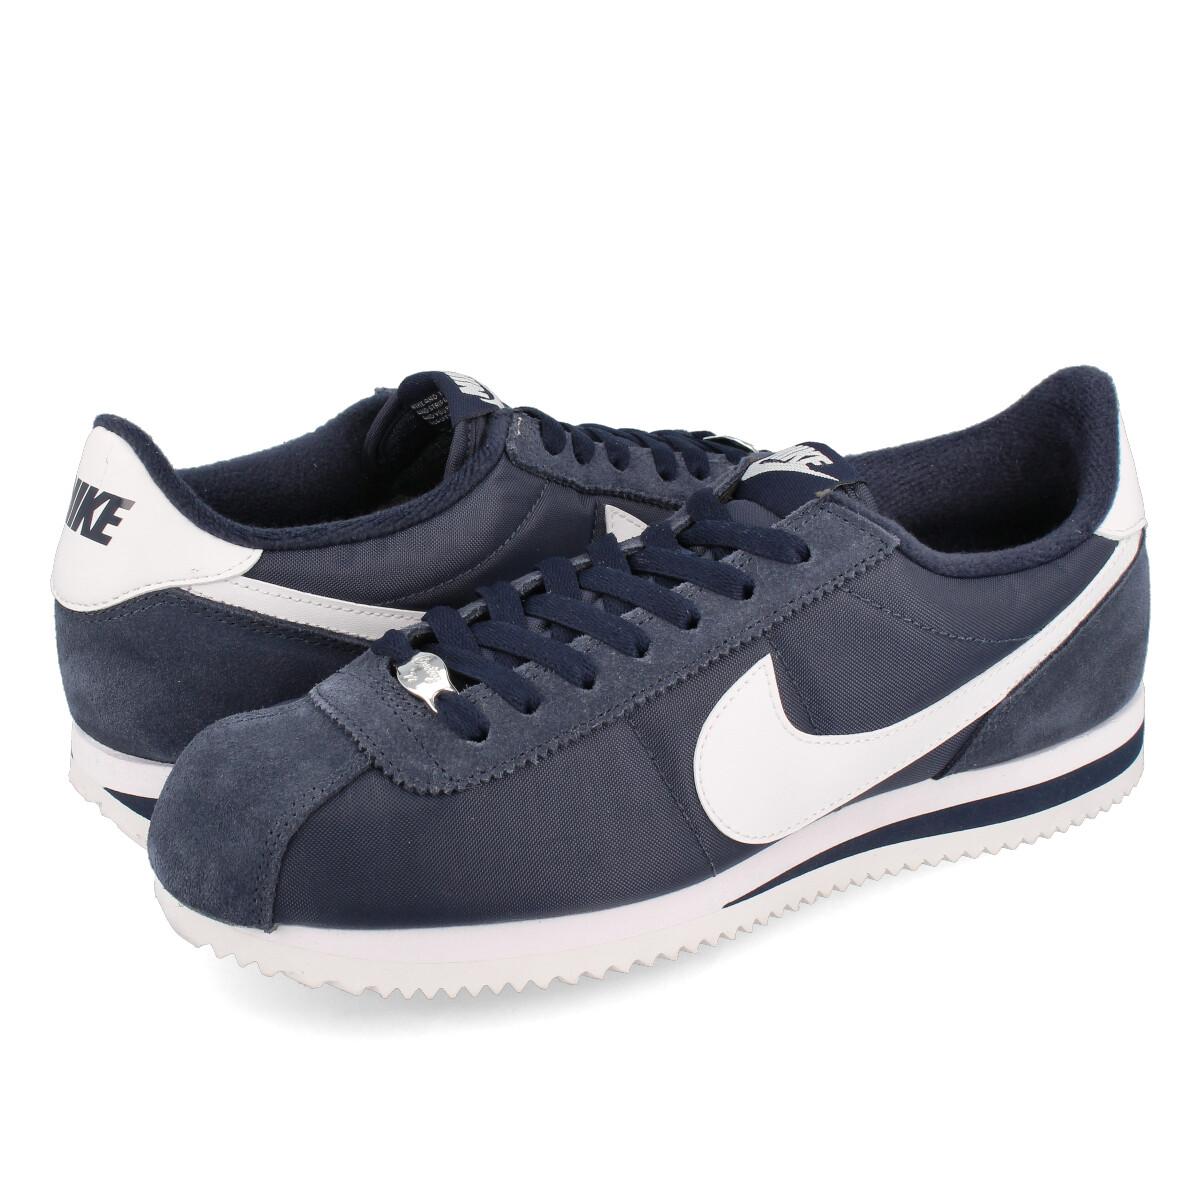 sports shoes 34f05 9e03e NIKE CORTEZ BASIC NYLON ナイキコルテッツベーシックナイロン OBSIDIAN WHITE METALLIC SILVER  819,720-411